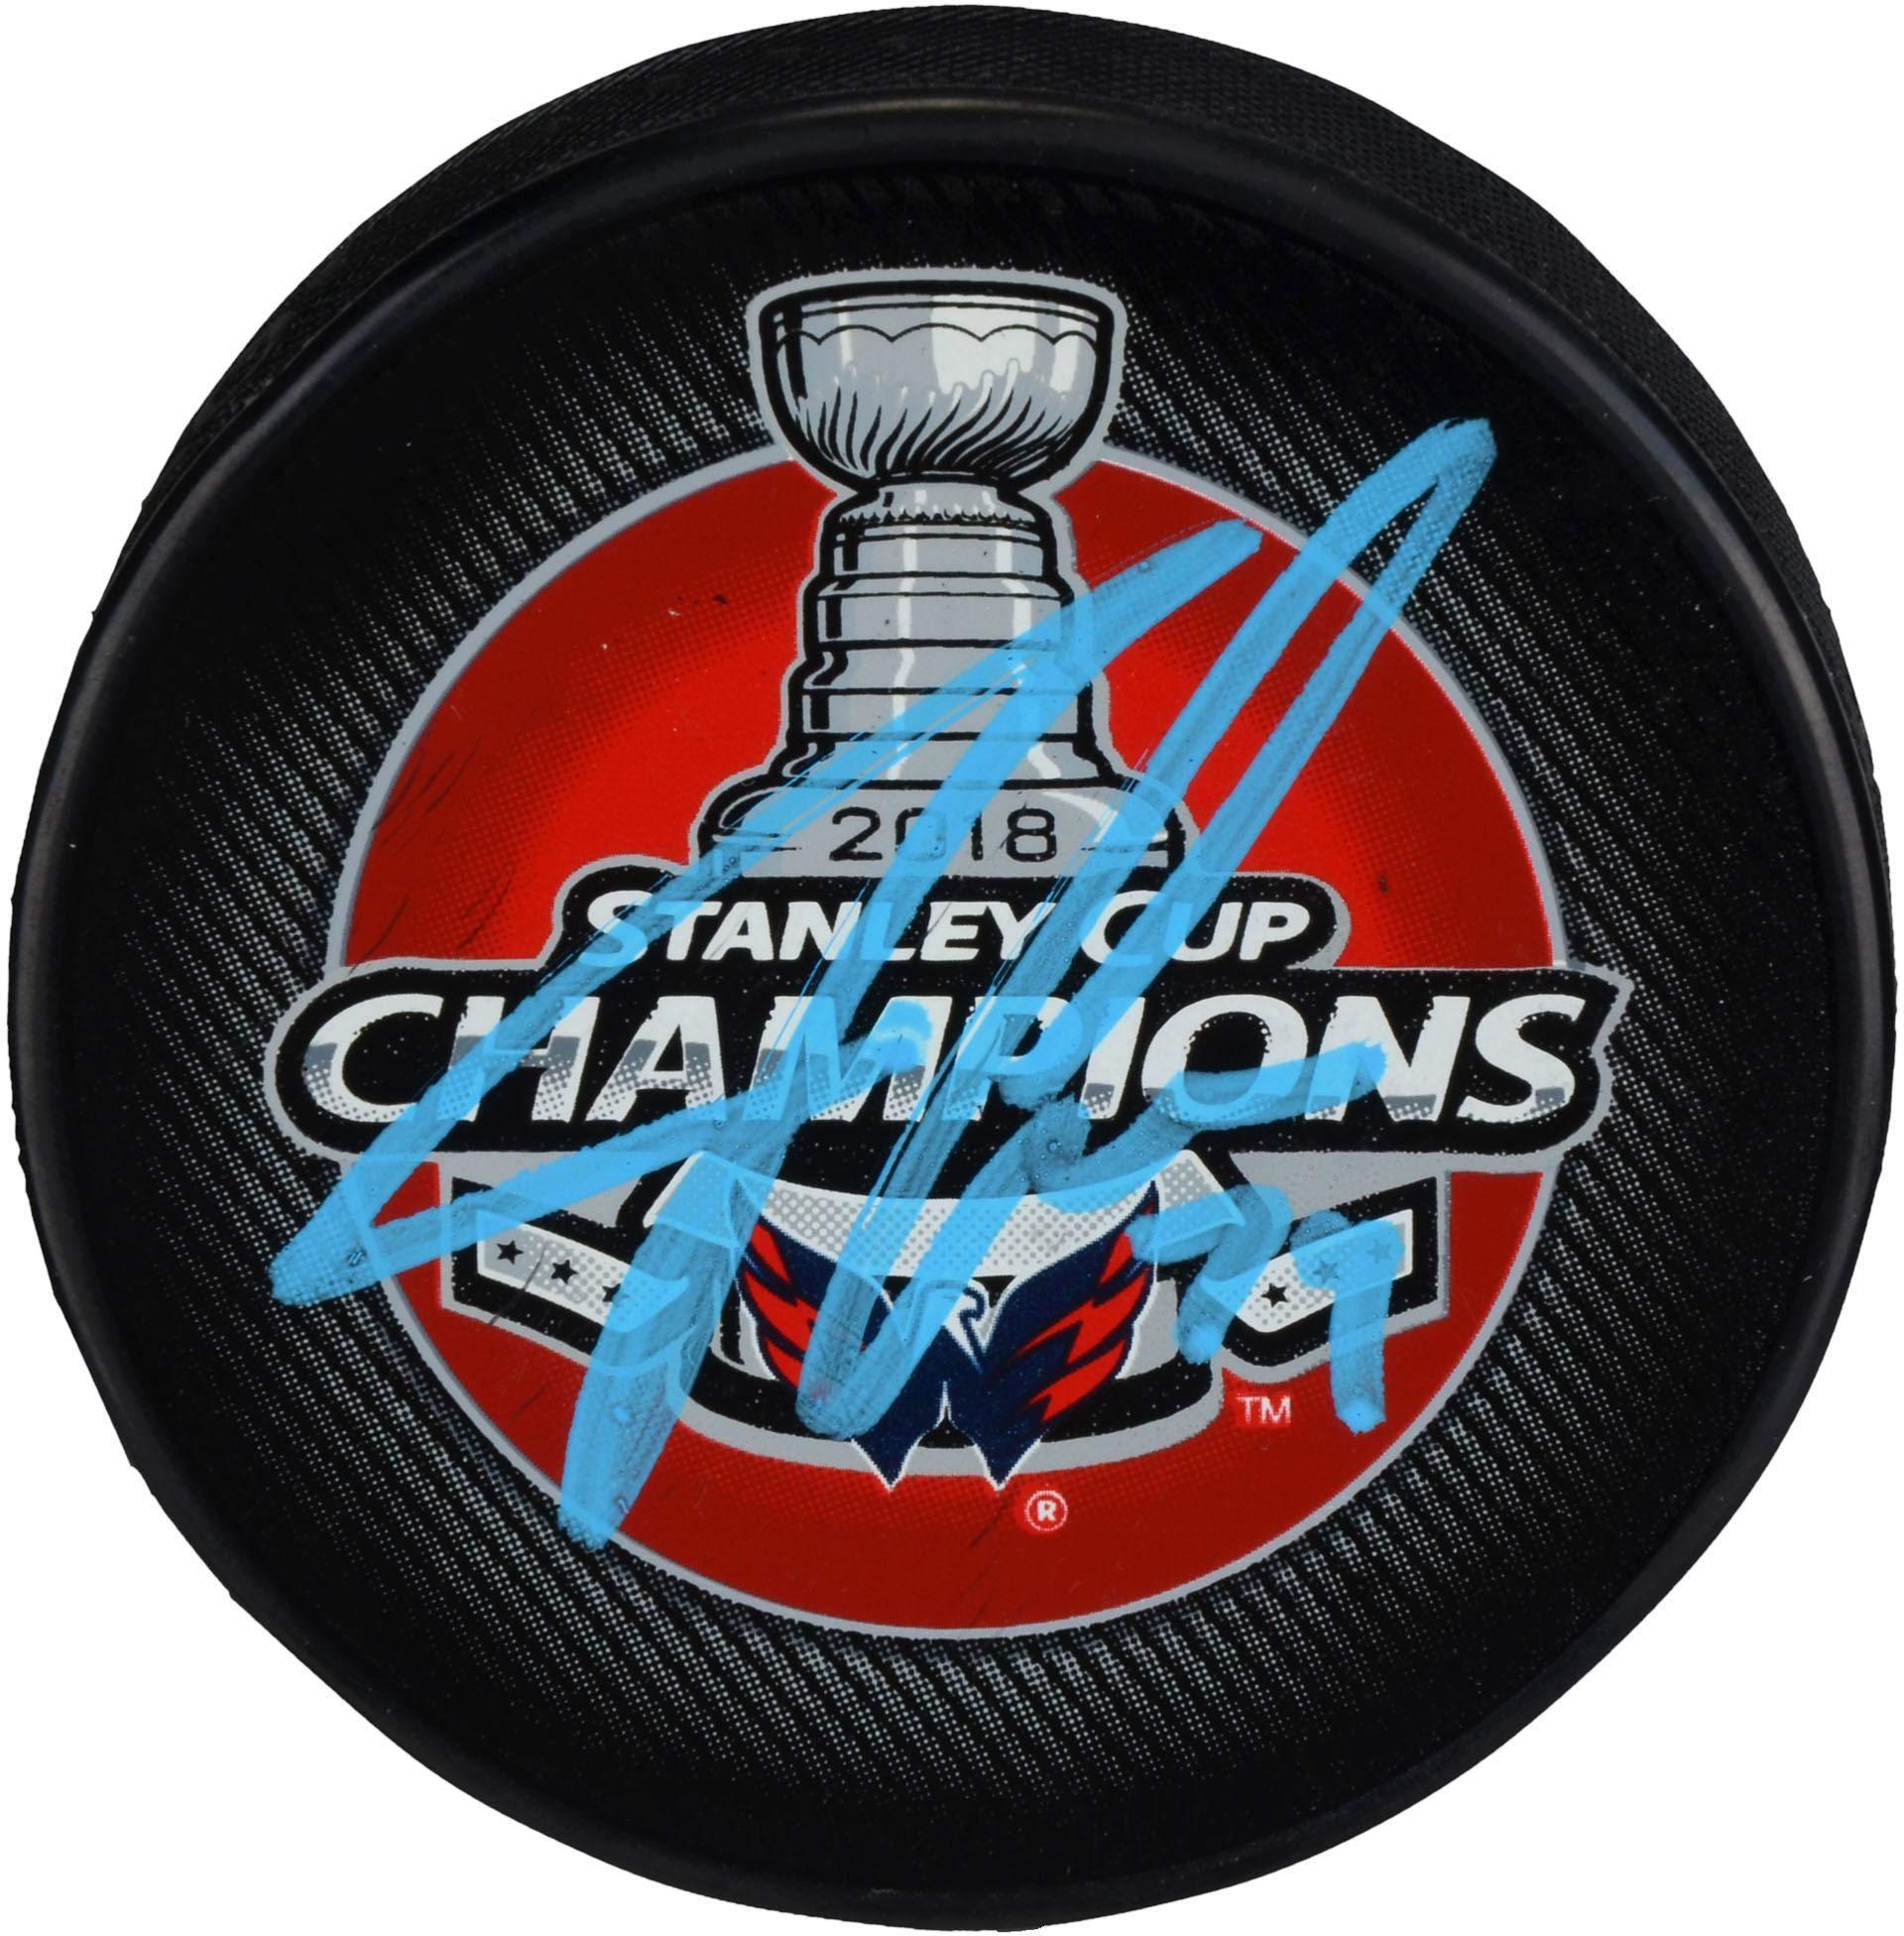 John Carlson Washington Capitals 2018 Stanley Cup Champions Autographed Stanley Cup Champions Logo Hockey Puck Fanatics Authentic Certified